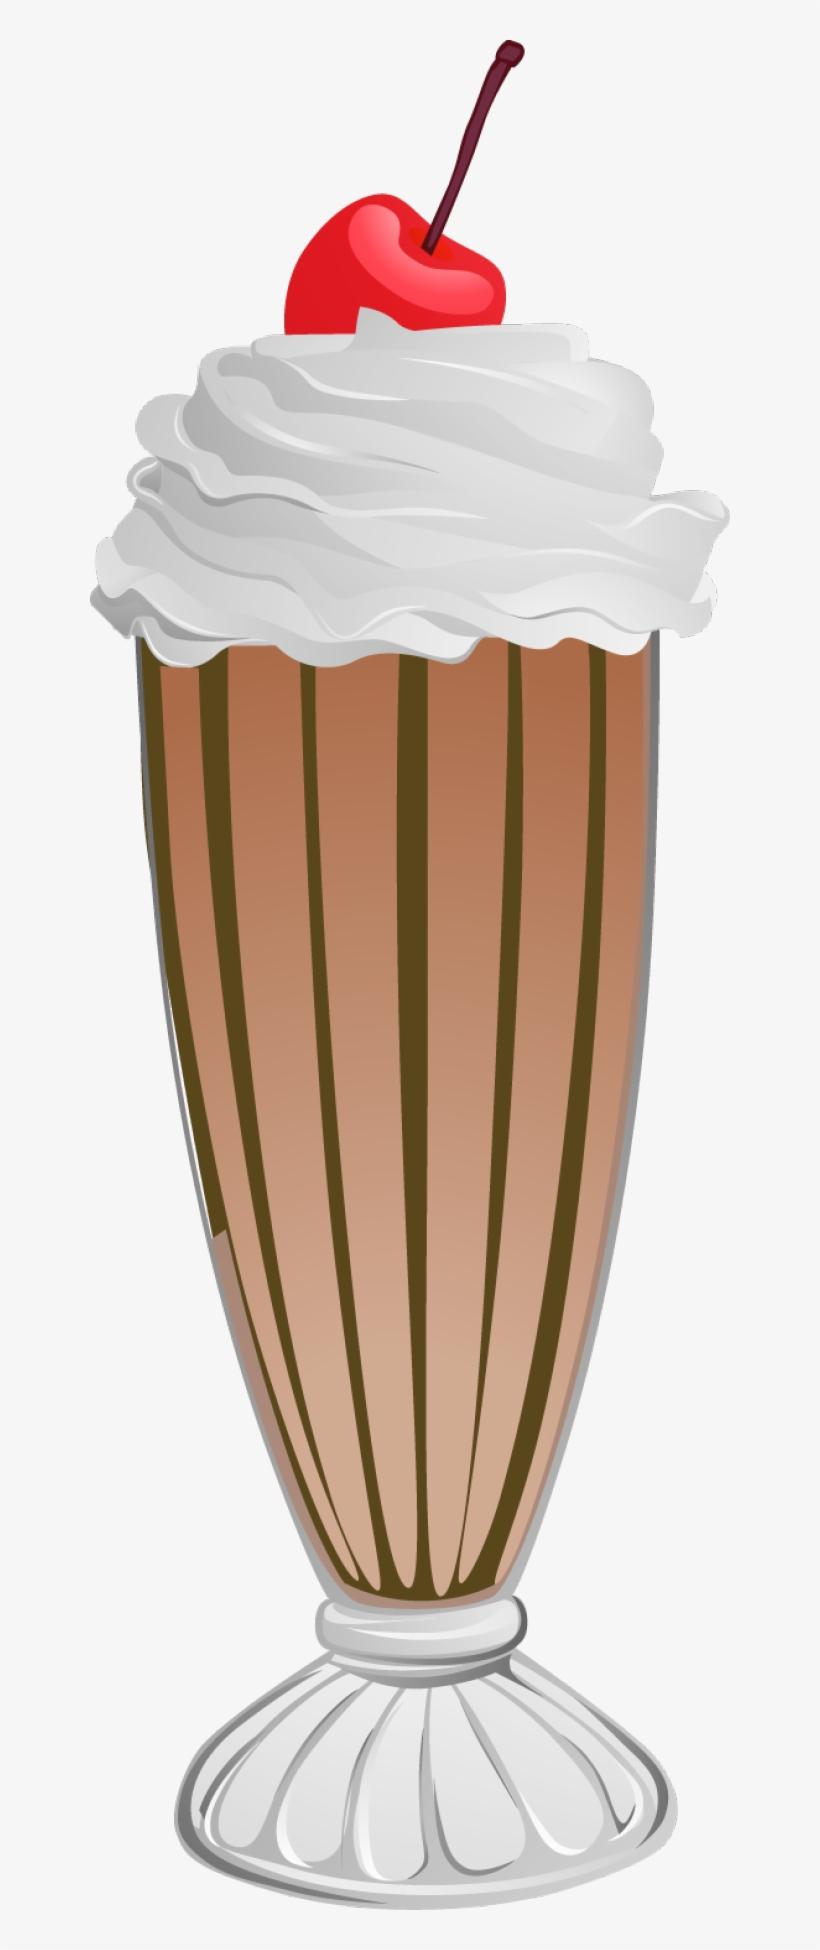 Milkshake clipart clip art, Milkshake clip art Transparent.